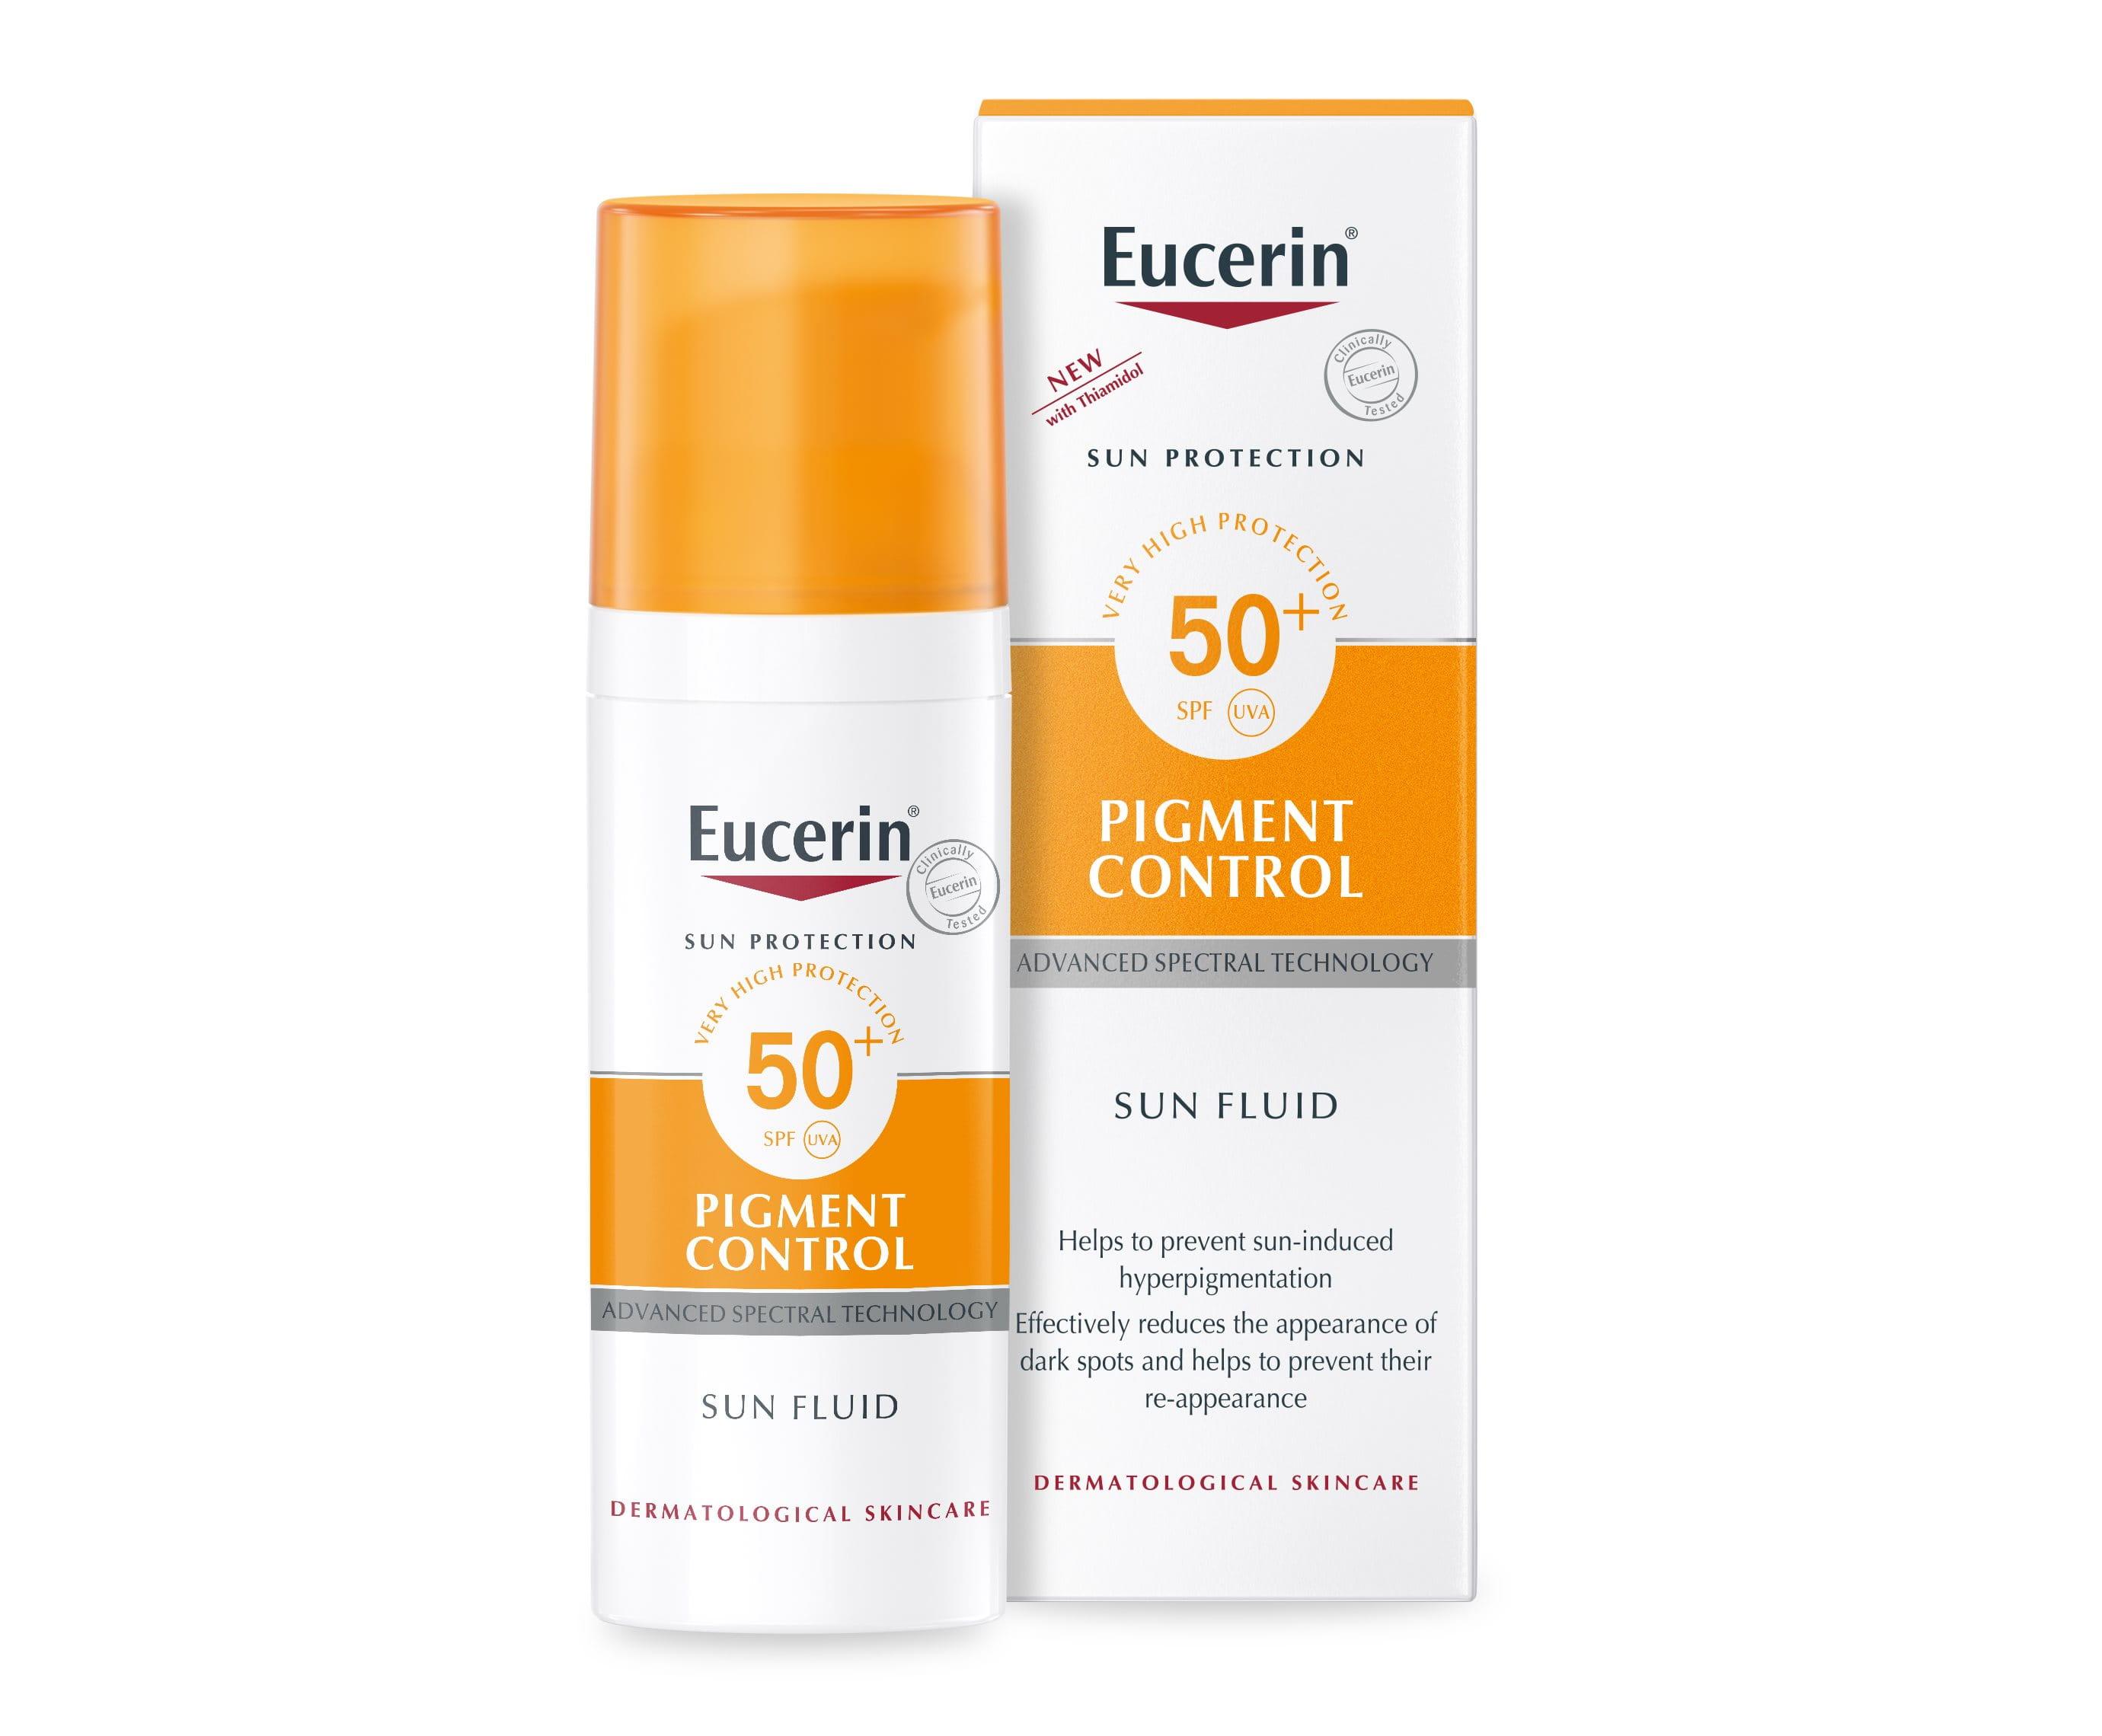 97909385de9d Sun Fluid Pigment Control SPF 50+   Facial sunscreen to prevent sun ...